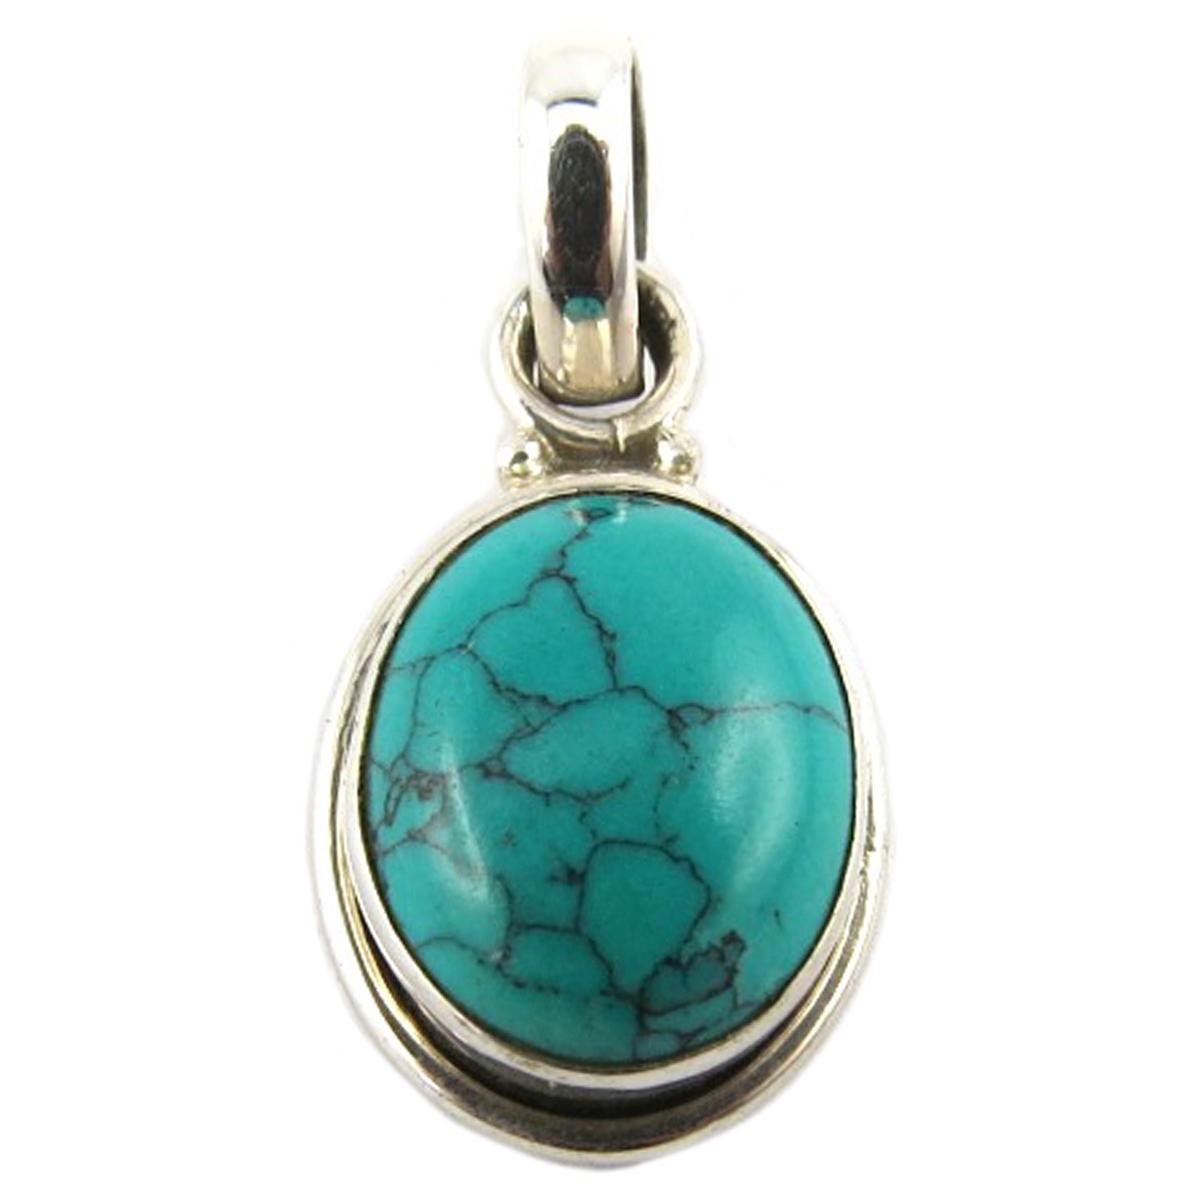 Pendentif Argent artisanal \'Heaven\' turquoise - 13x10 mm - [Q9869]